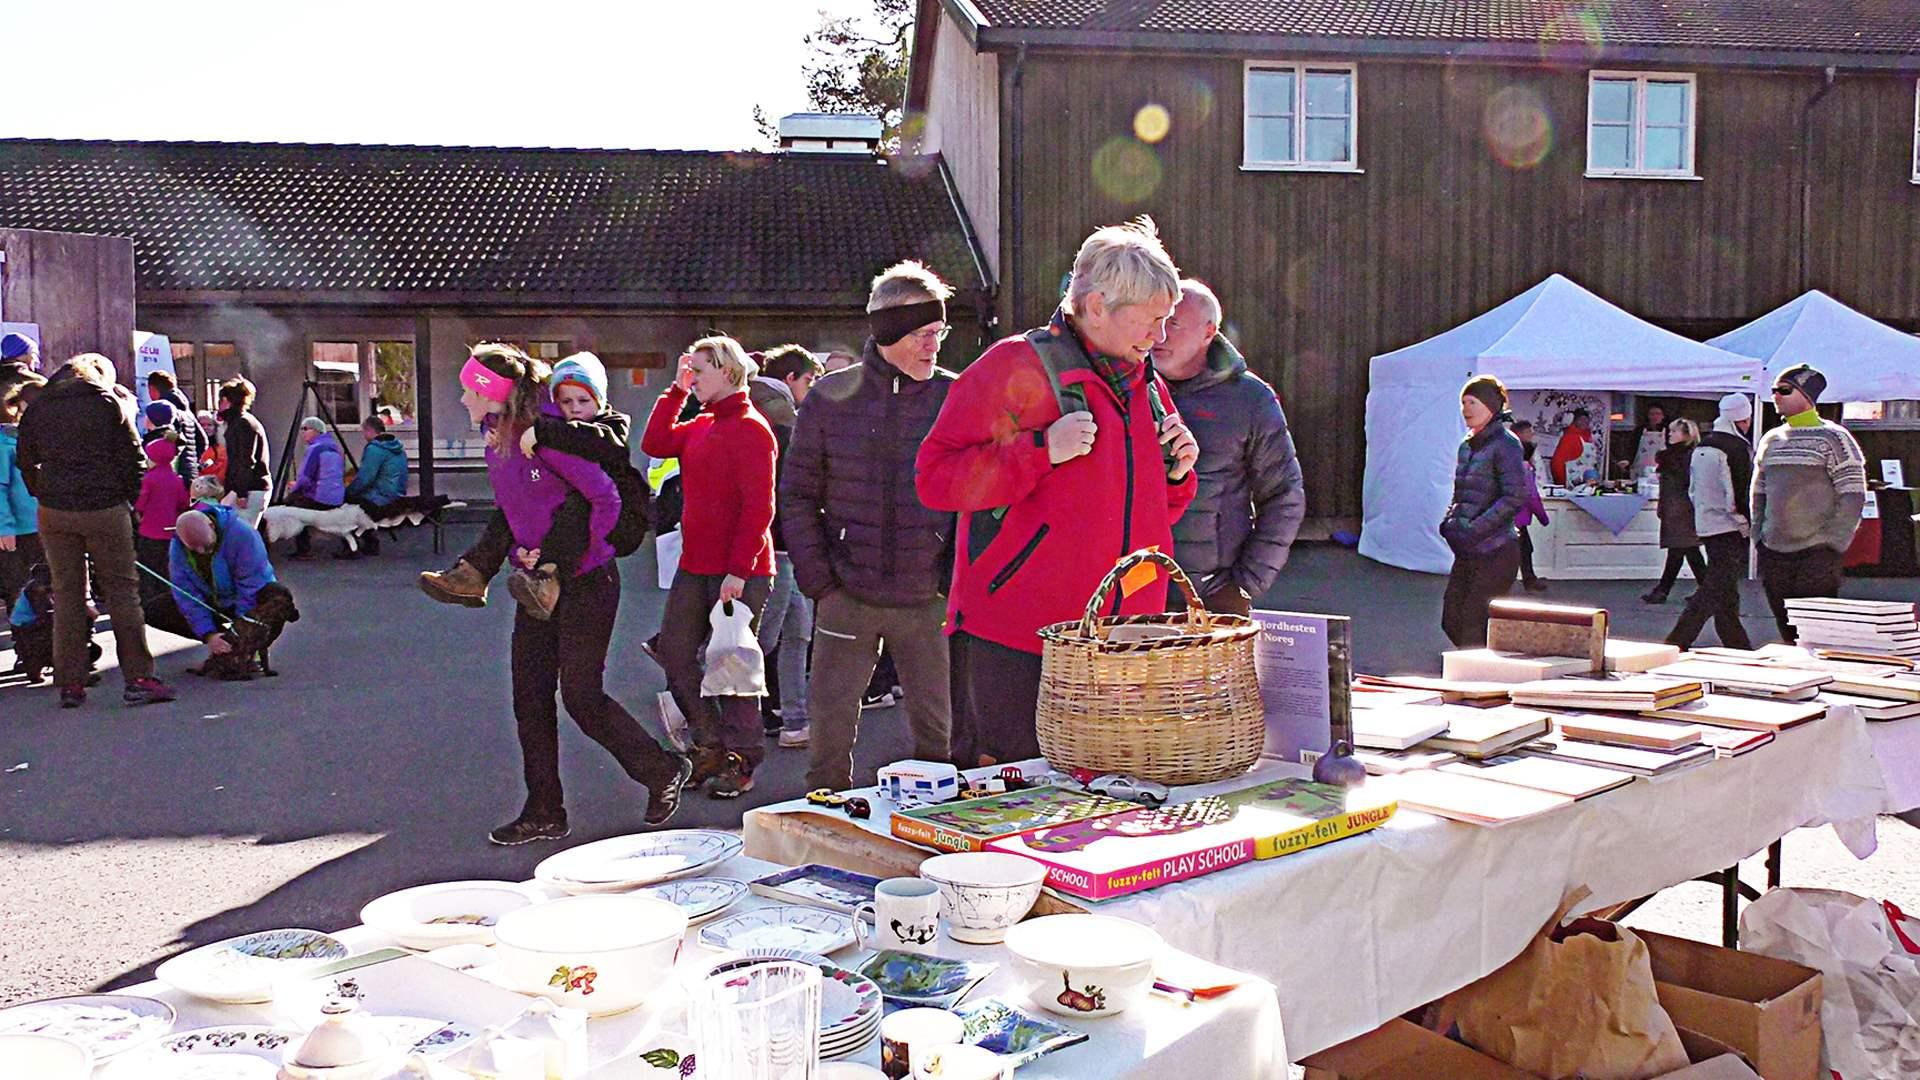 Høstfest og handlegate i Rauland sentrum (Foto: Danny Seterdal)